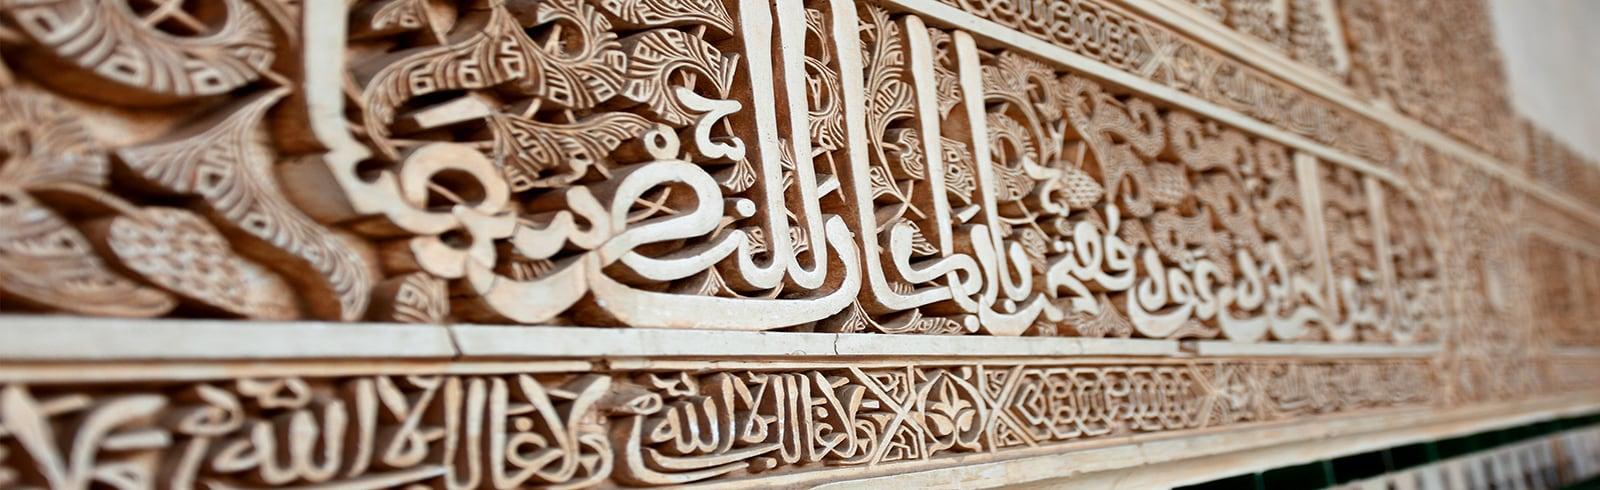 The Shariah Supervisory Committee